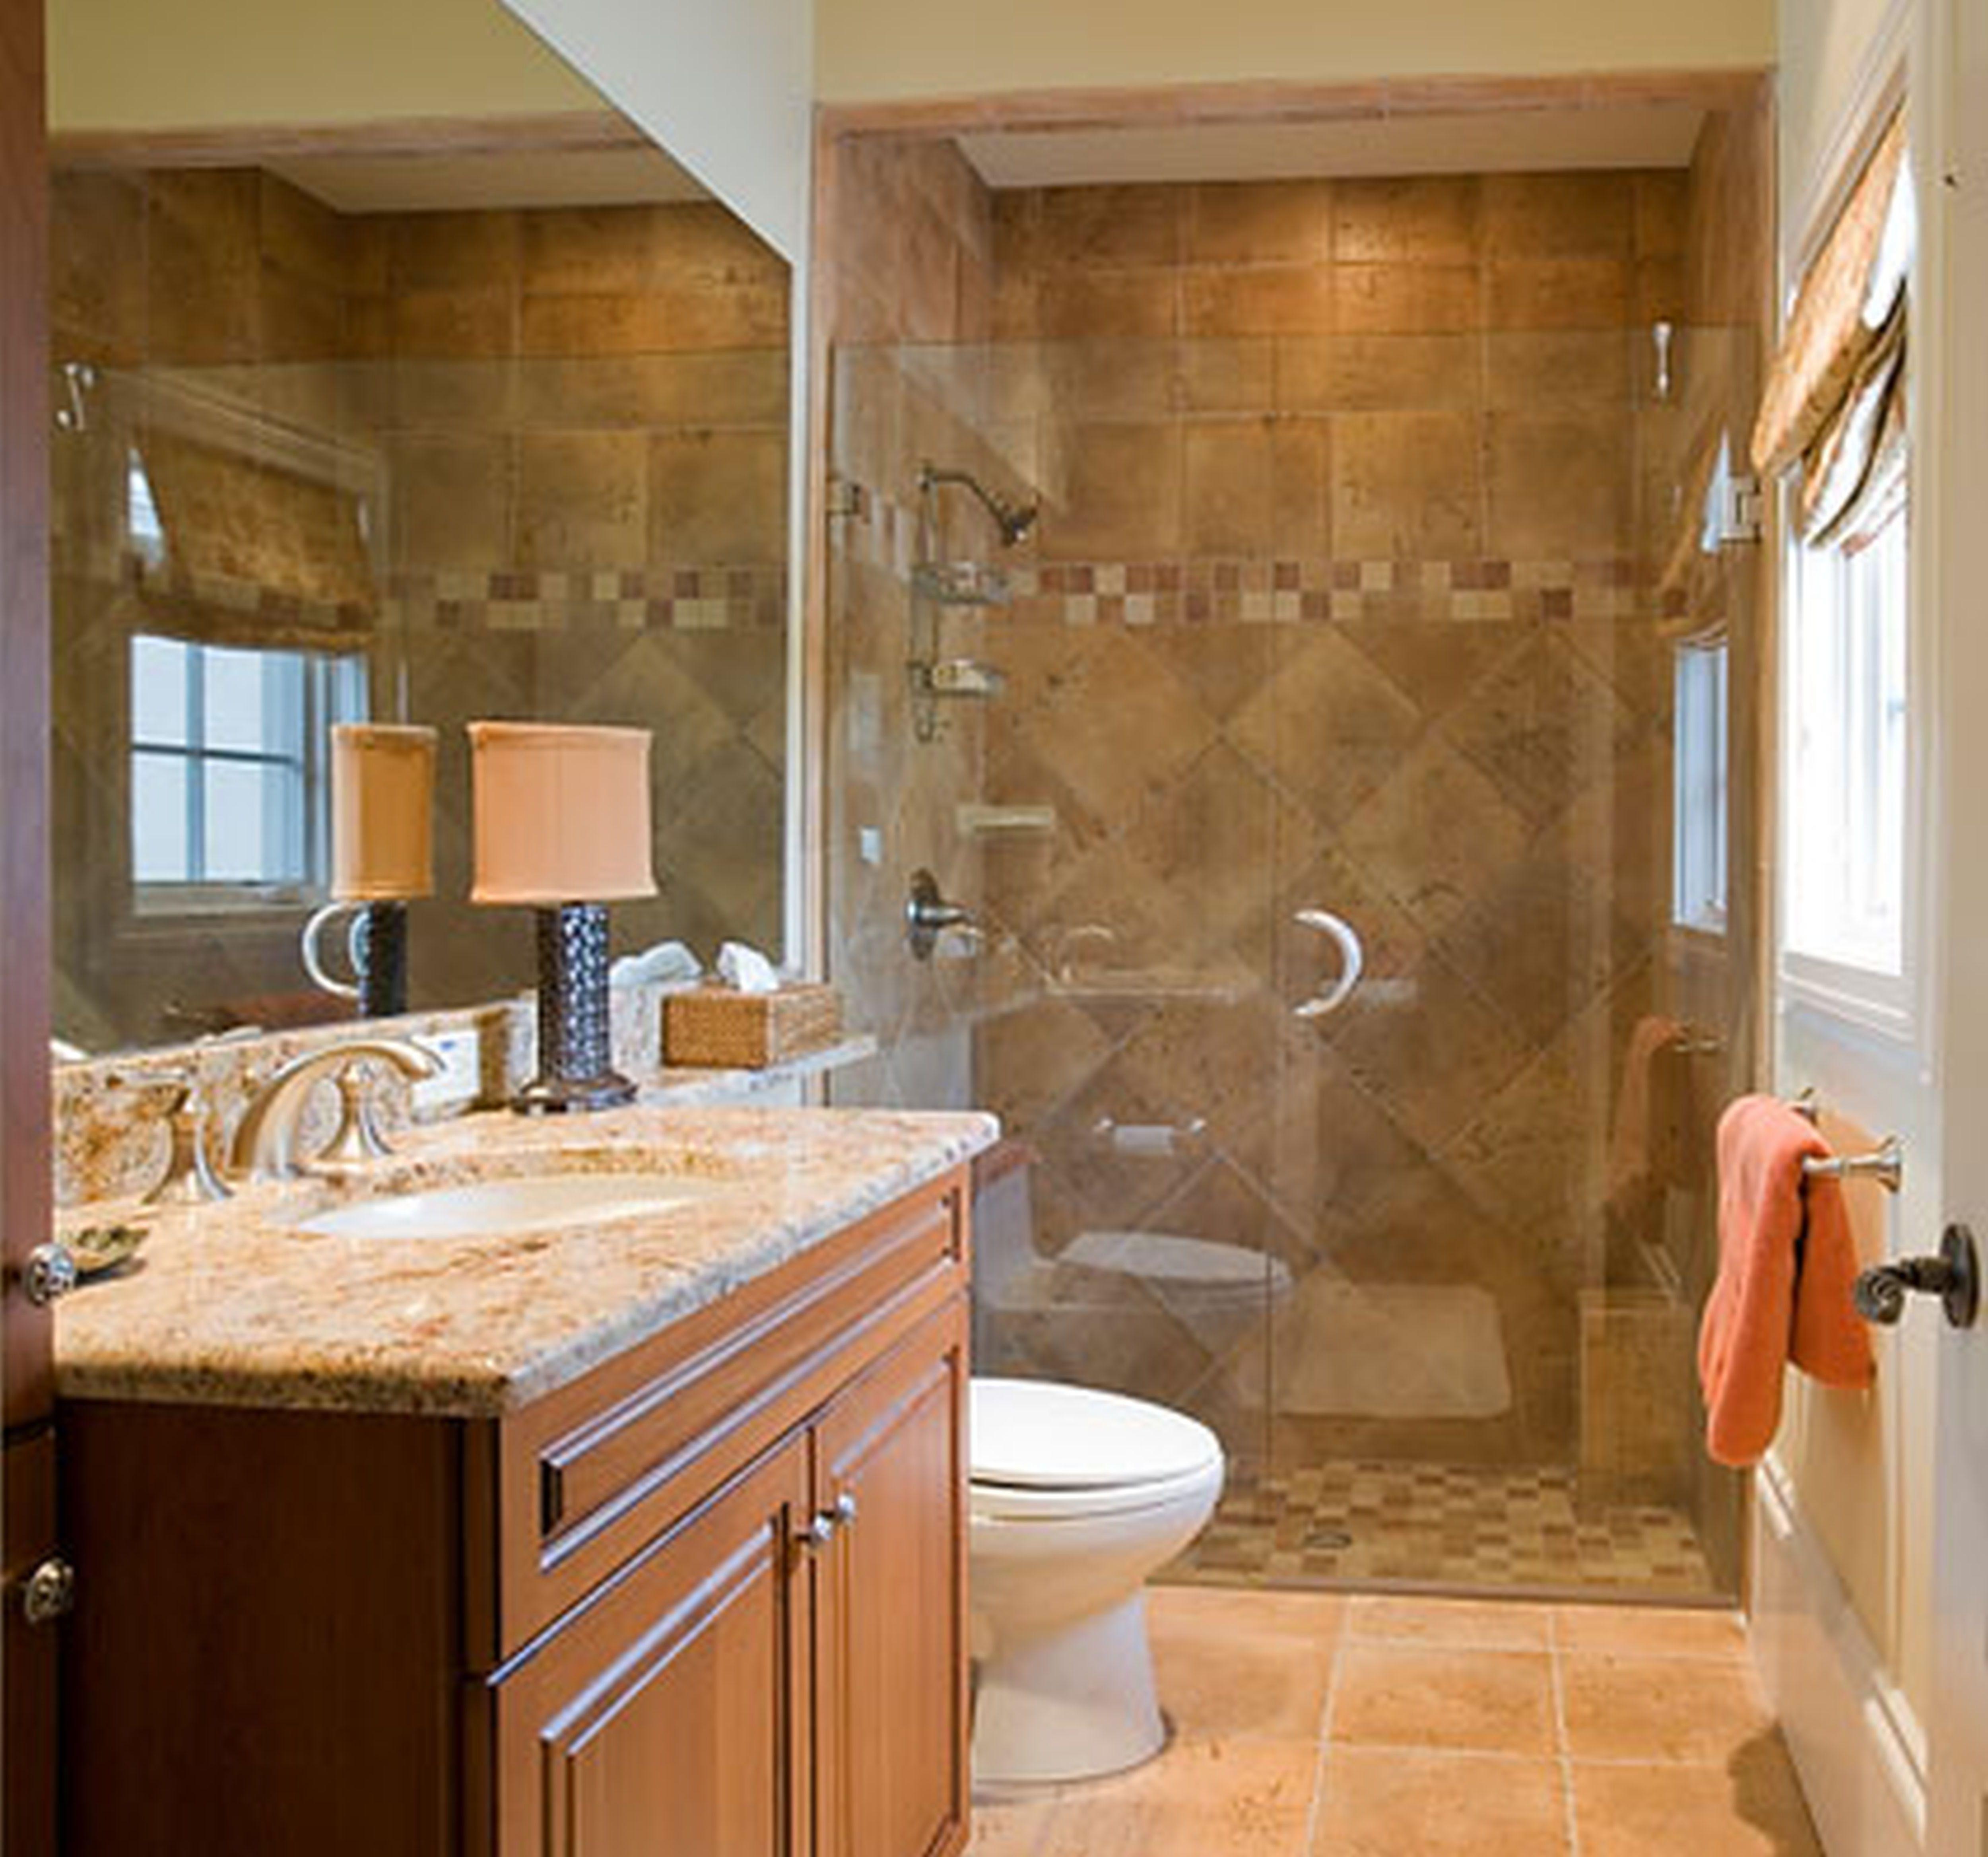 Small Bathroom Remodel Ideas Unique Small Bathroom Remodel